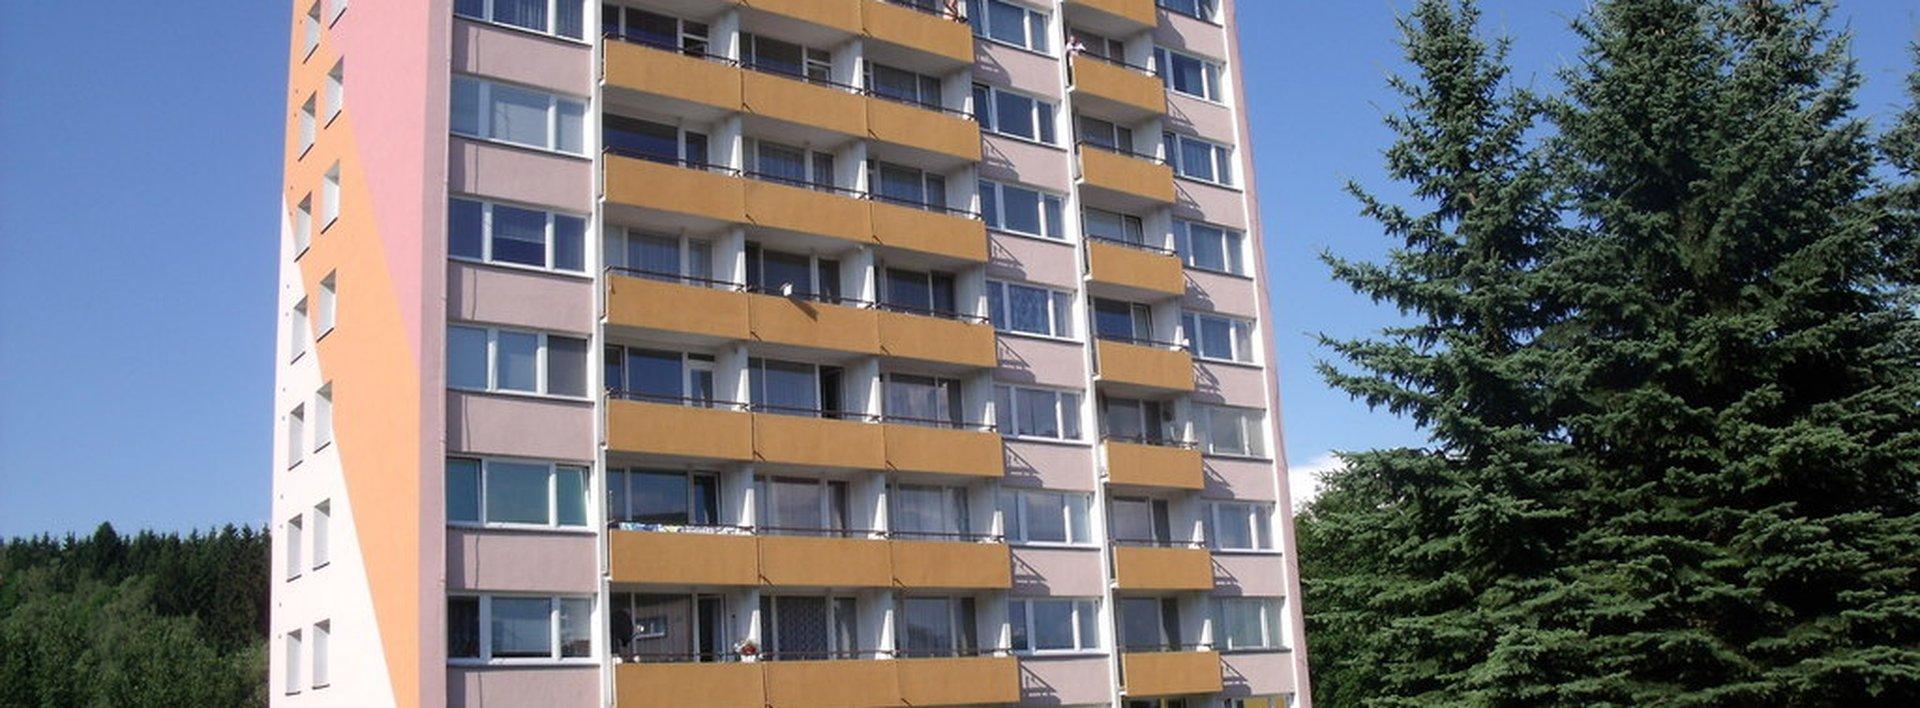 Prodej slunného bytu 3+1/L s krásnými výhledy v Tanvaldu, Ev.č.: N46771